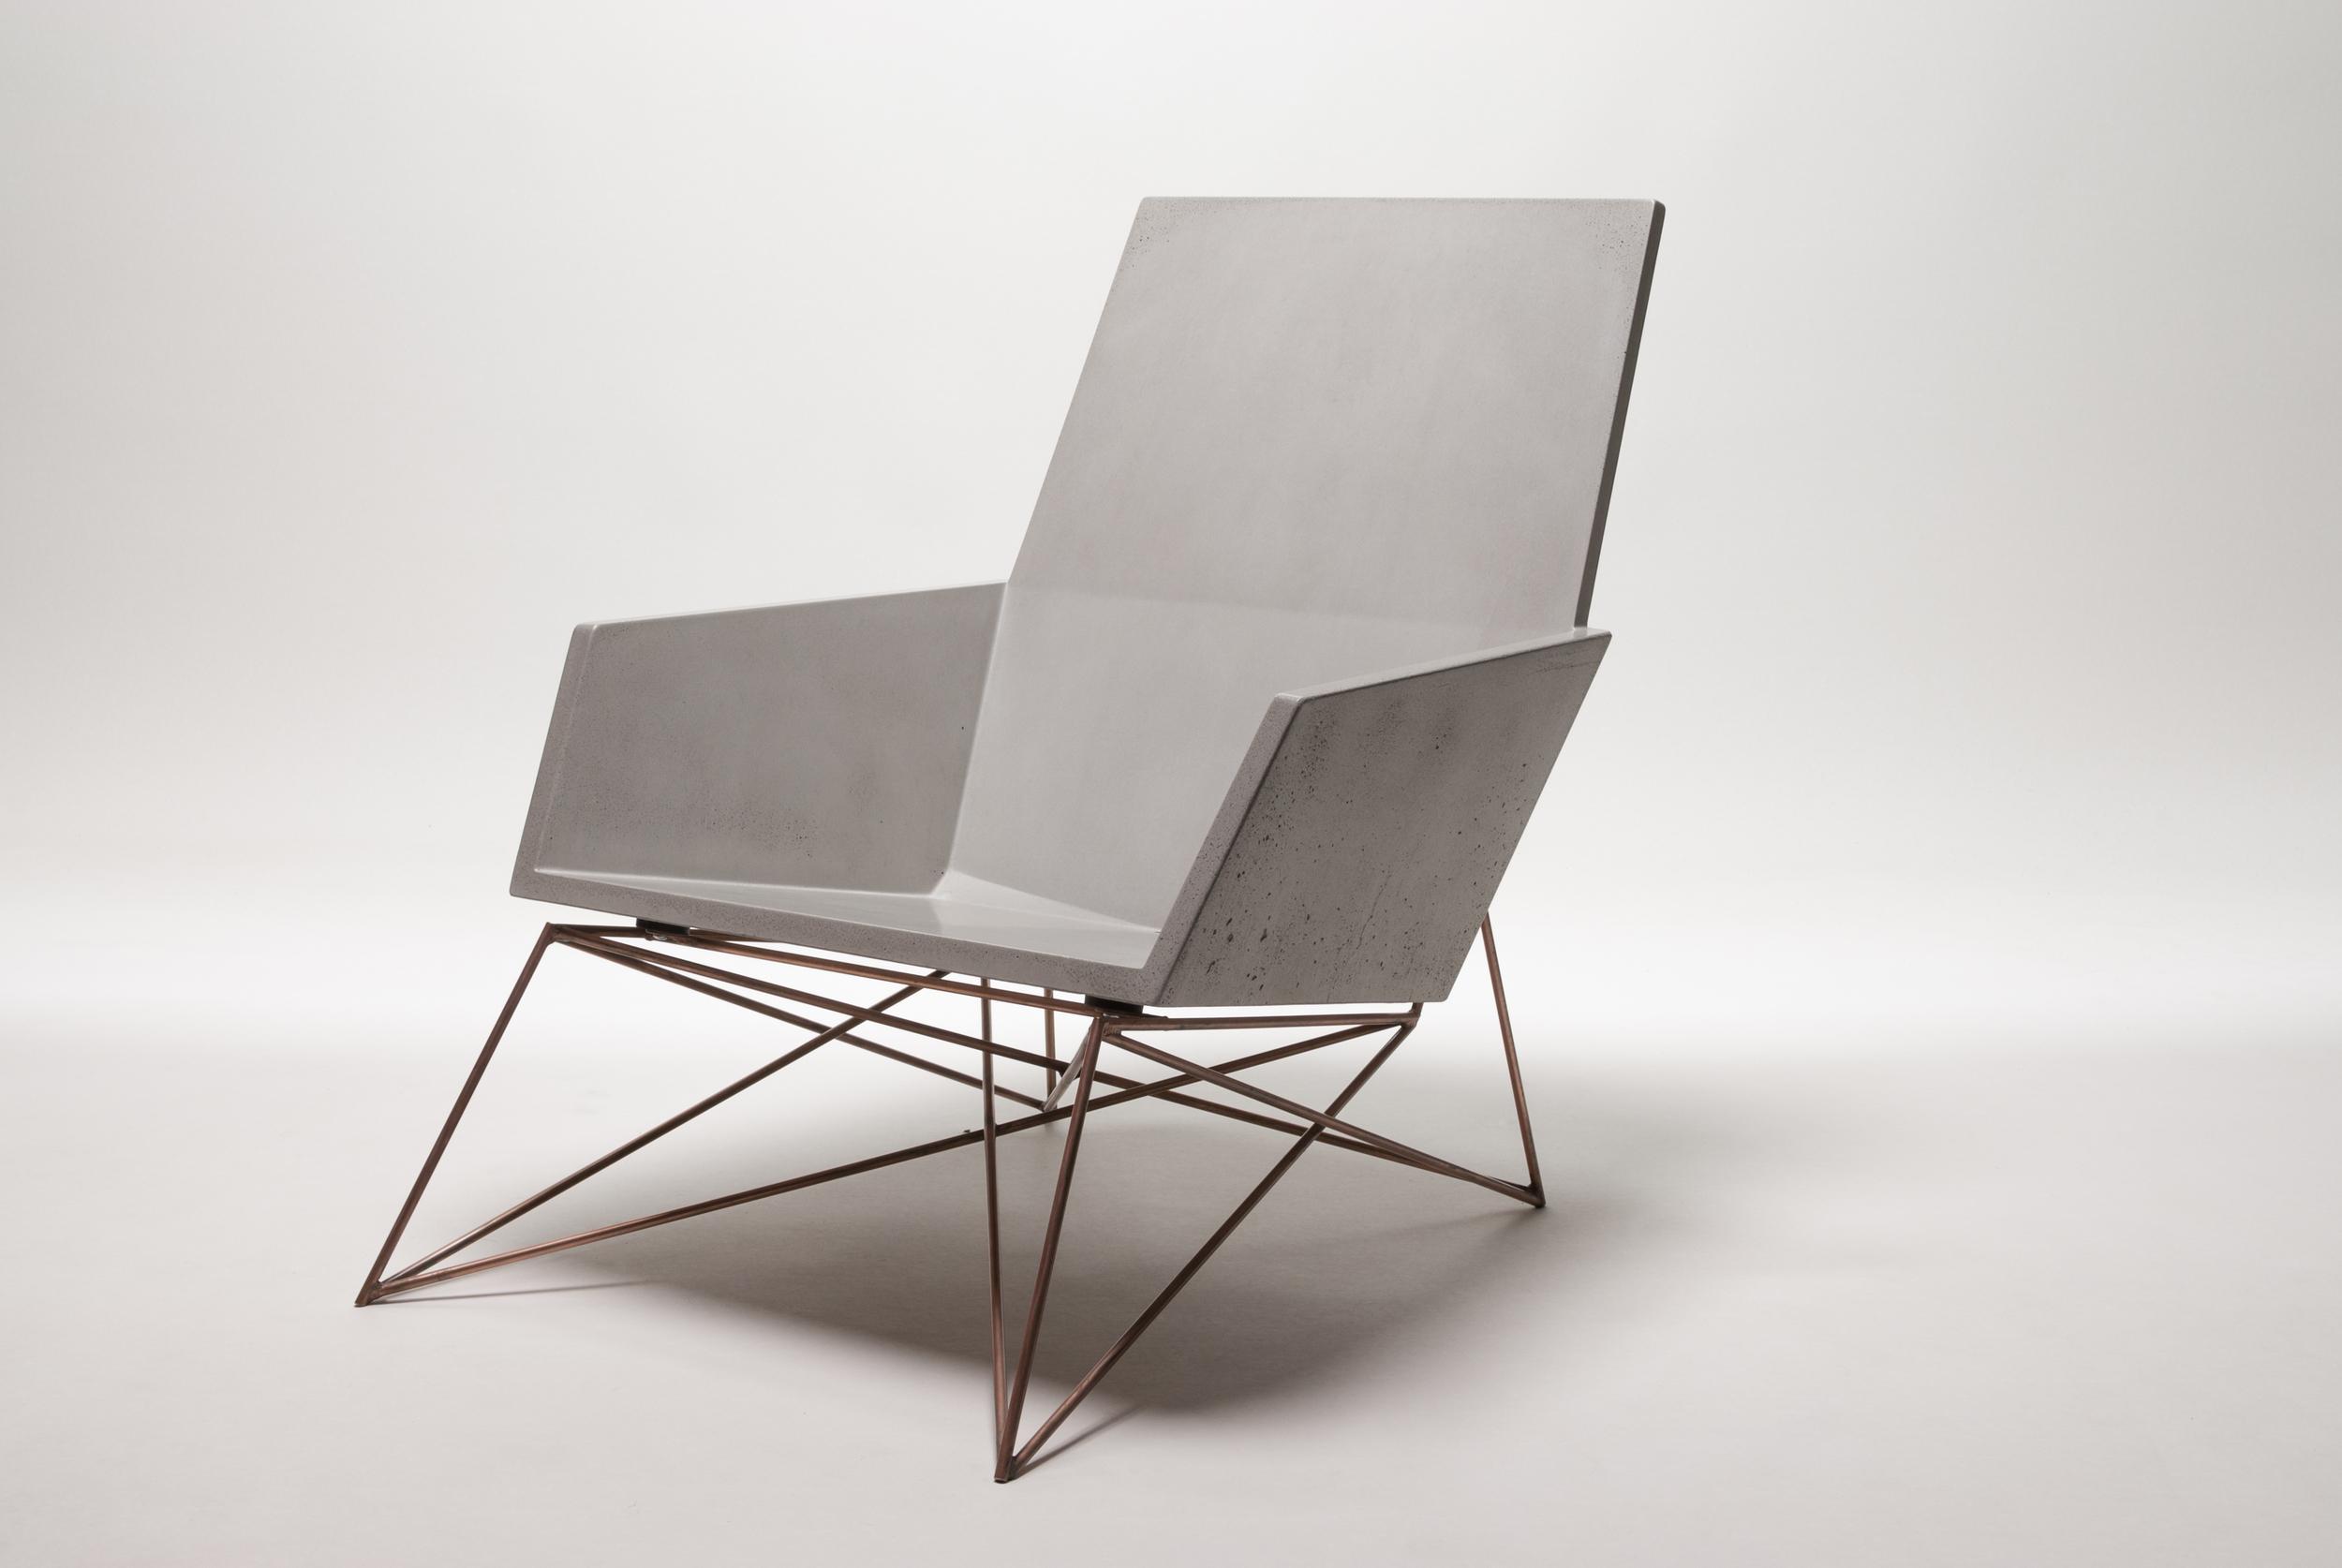 The Modern Muskoka Chair / by Hard Goods